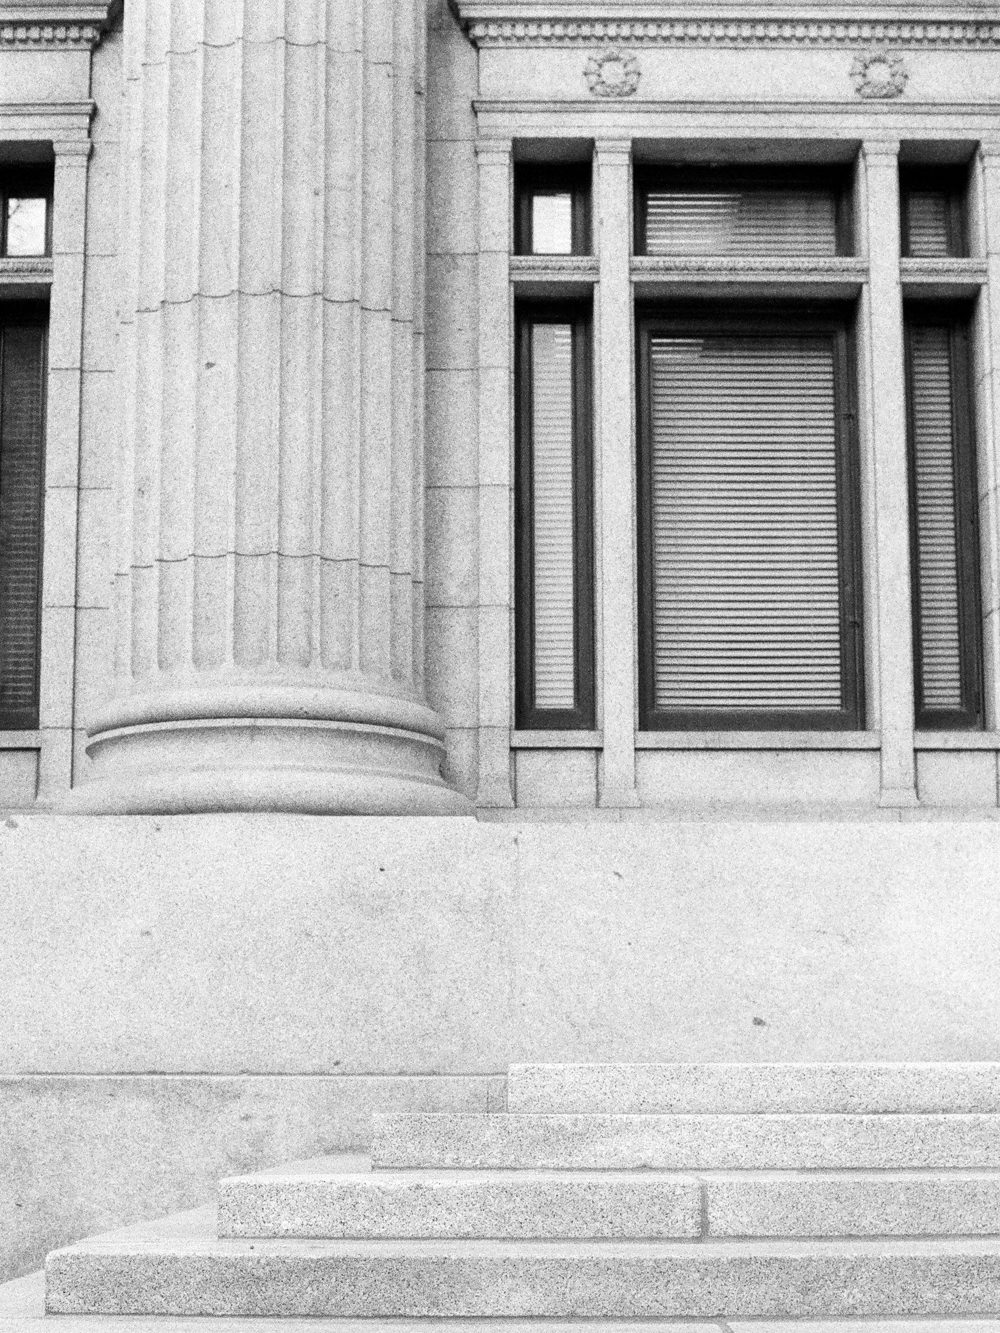 Christine-gosch-utah-film-photographer-destination-photographer-delta-3200-black-and-white-10.jpg